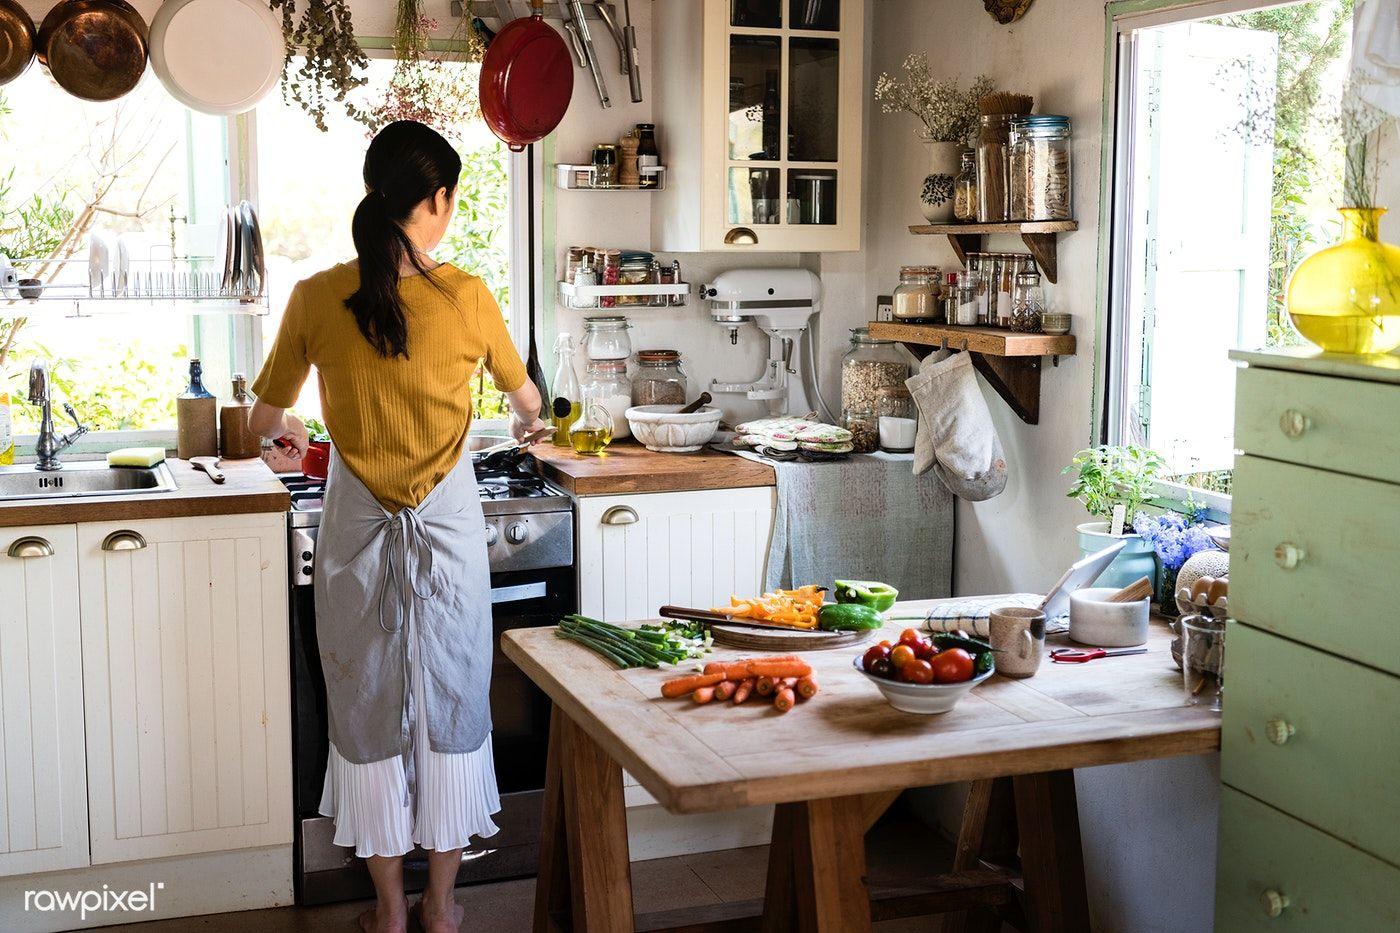 Download premium image of Japanese woman cooking in a countryside kitchen |  Countryside kitchen, Japanese women, Cooking kitchen